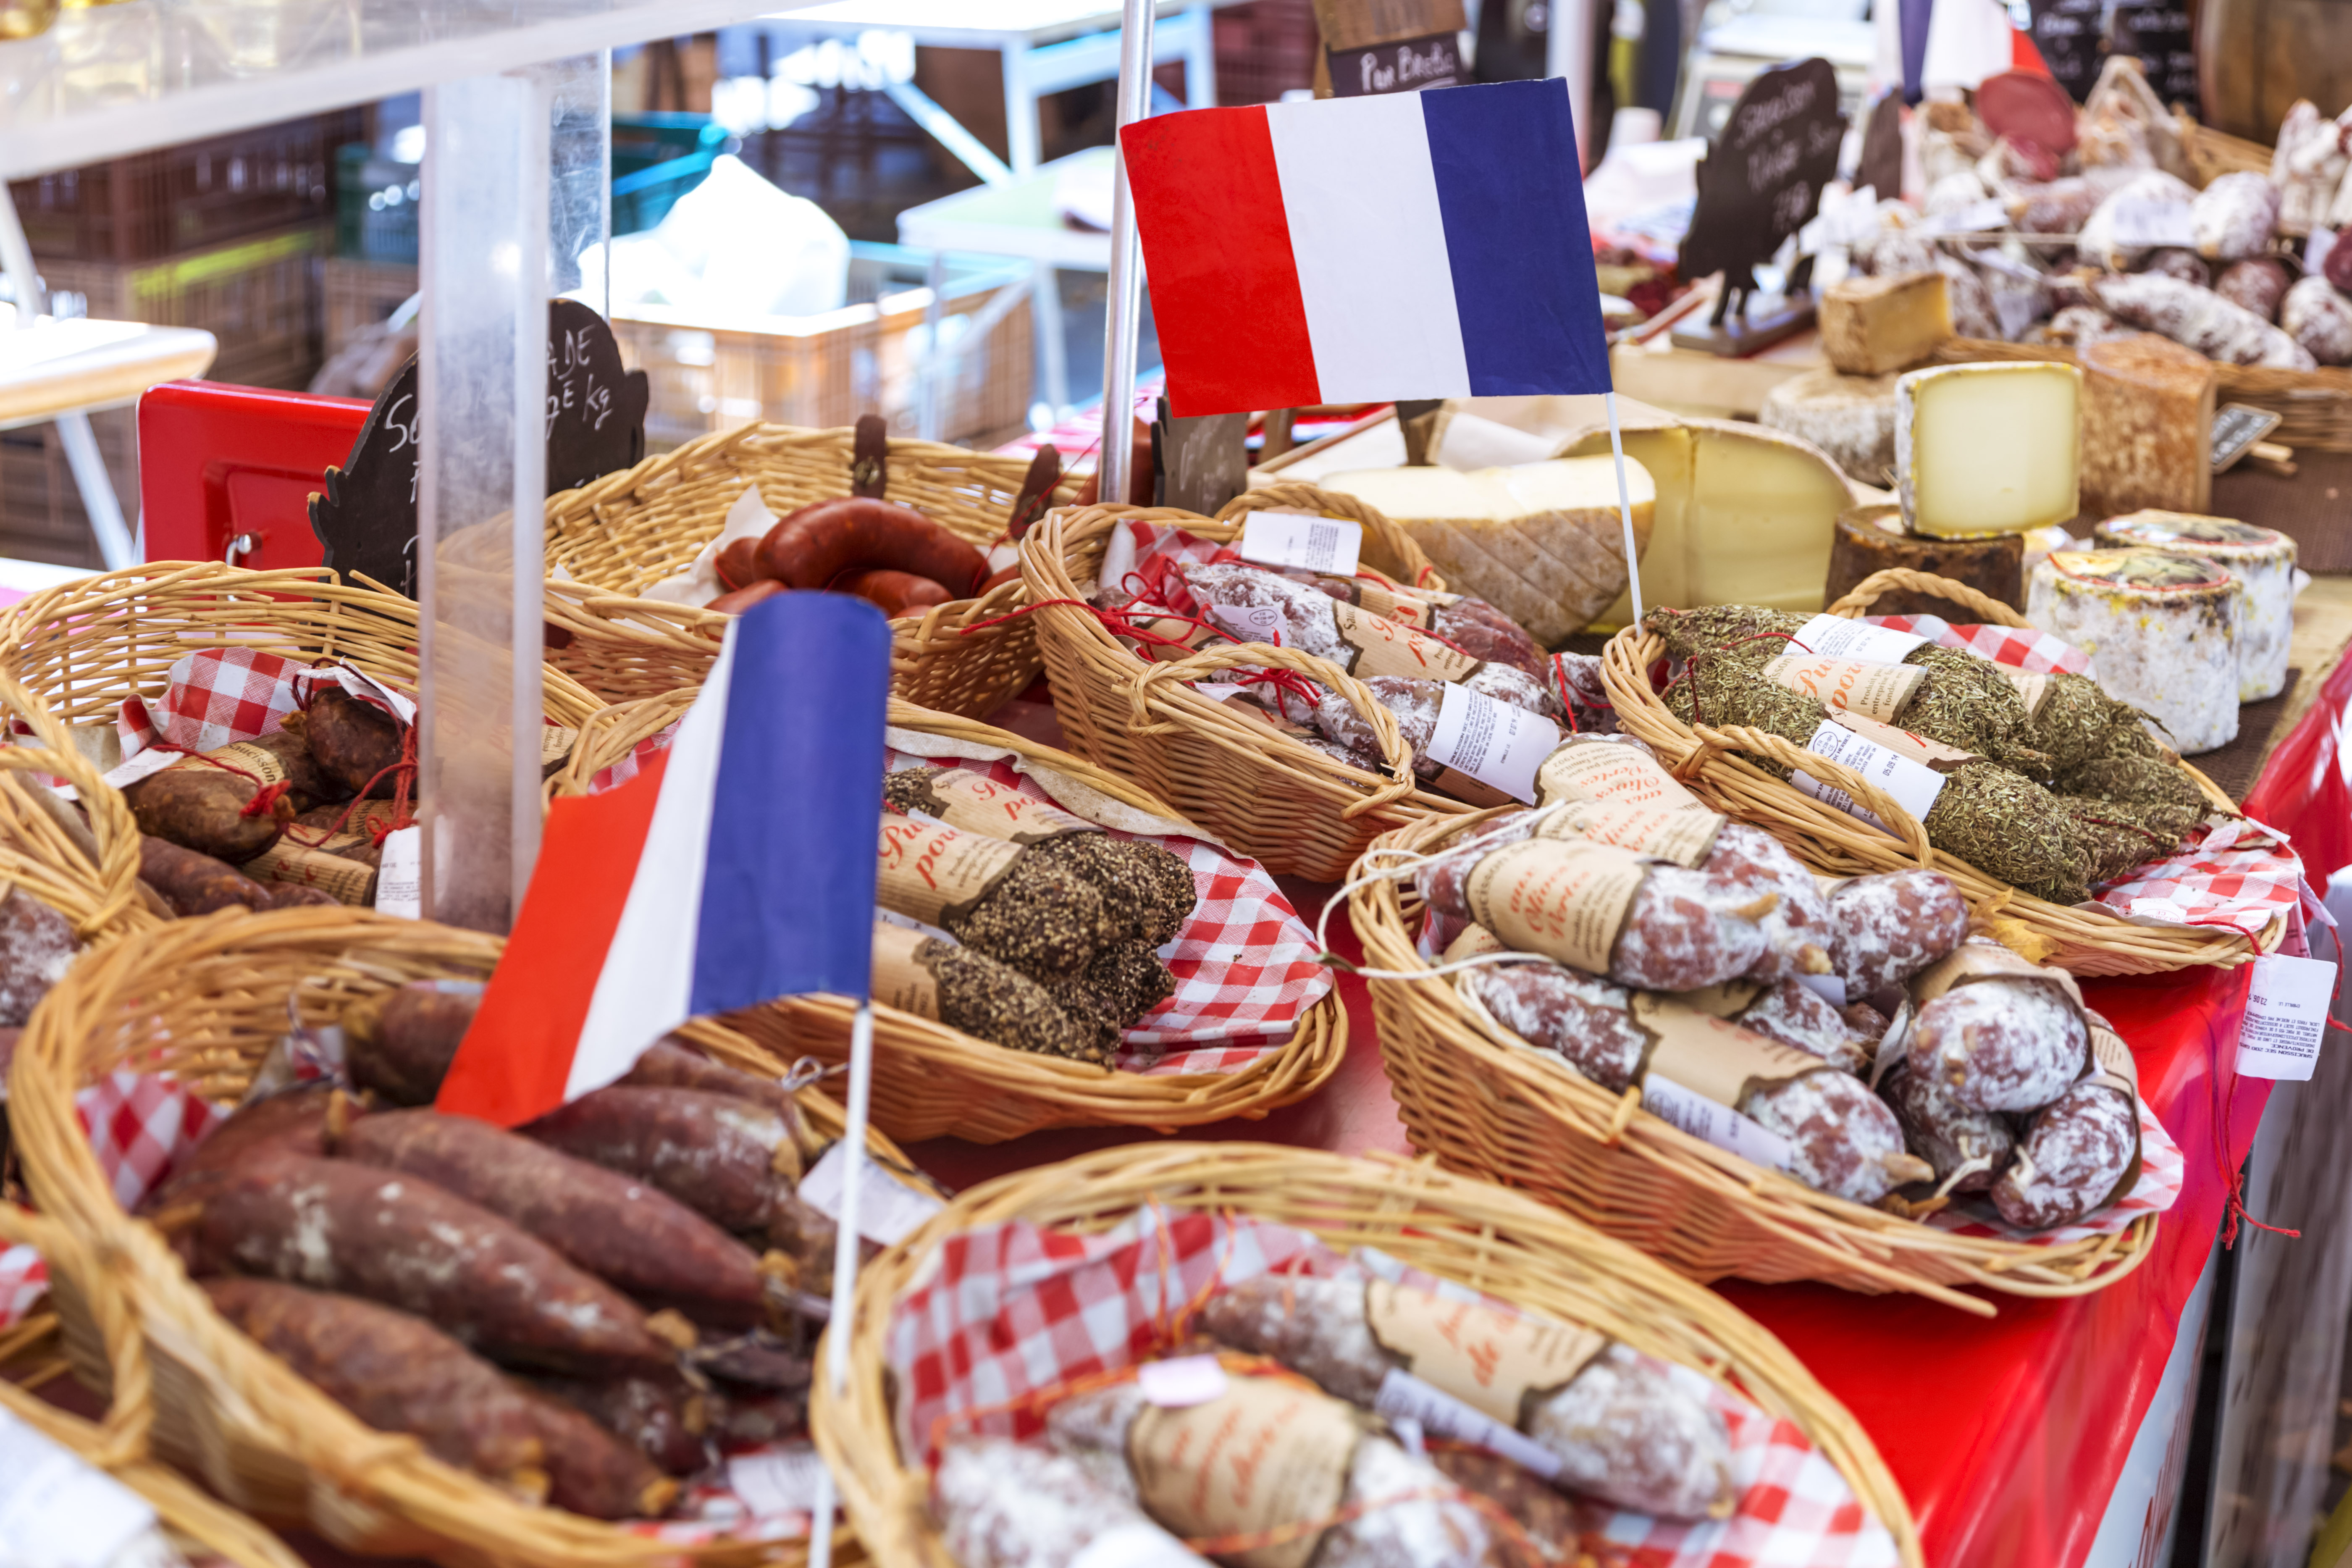 Gastronom a diplomacia y art de vivre la fran aise for Gastronomia de paris francia